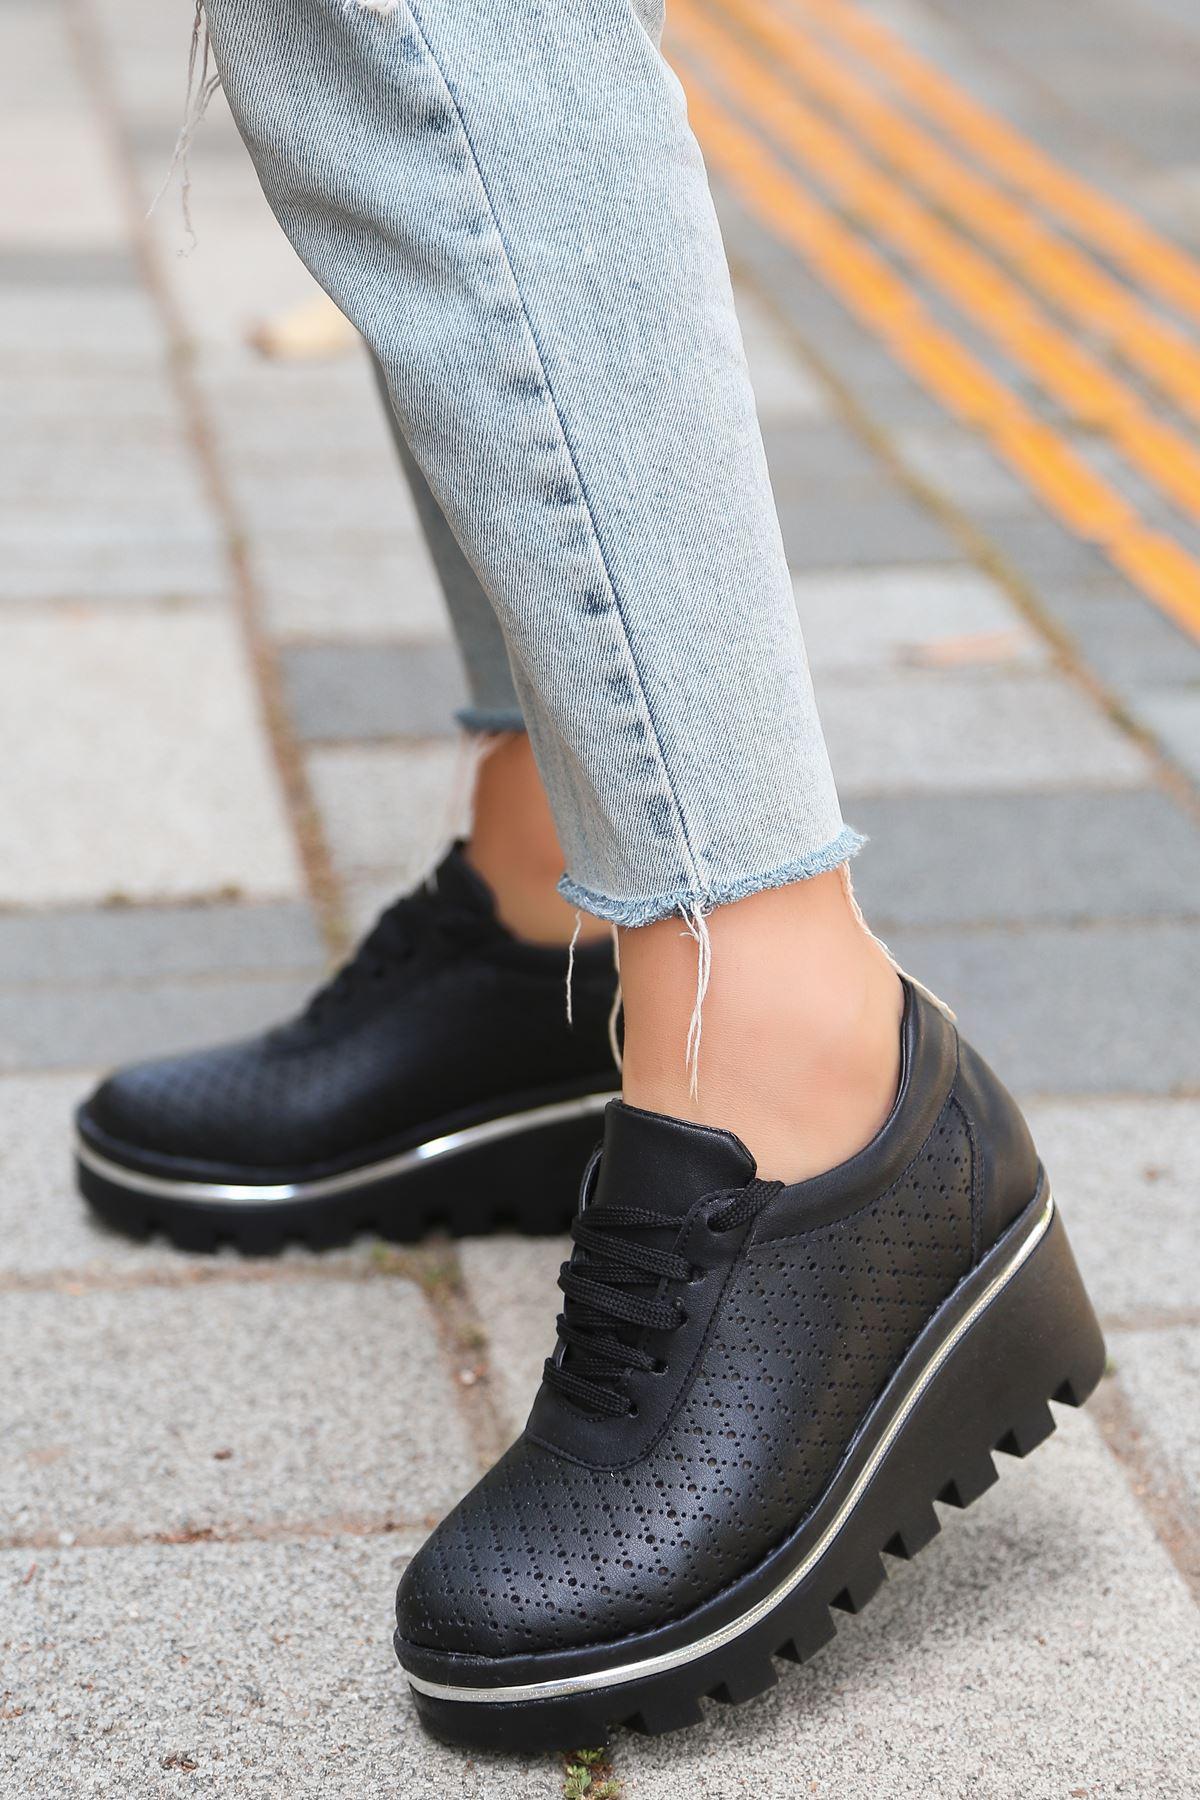 Jessie Mat Deri Bağcık Detay Lazer Kesim Dolgu Topuk Ayakkabı Siyah